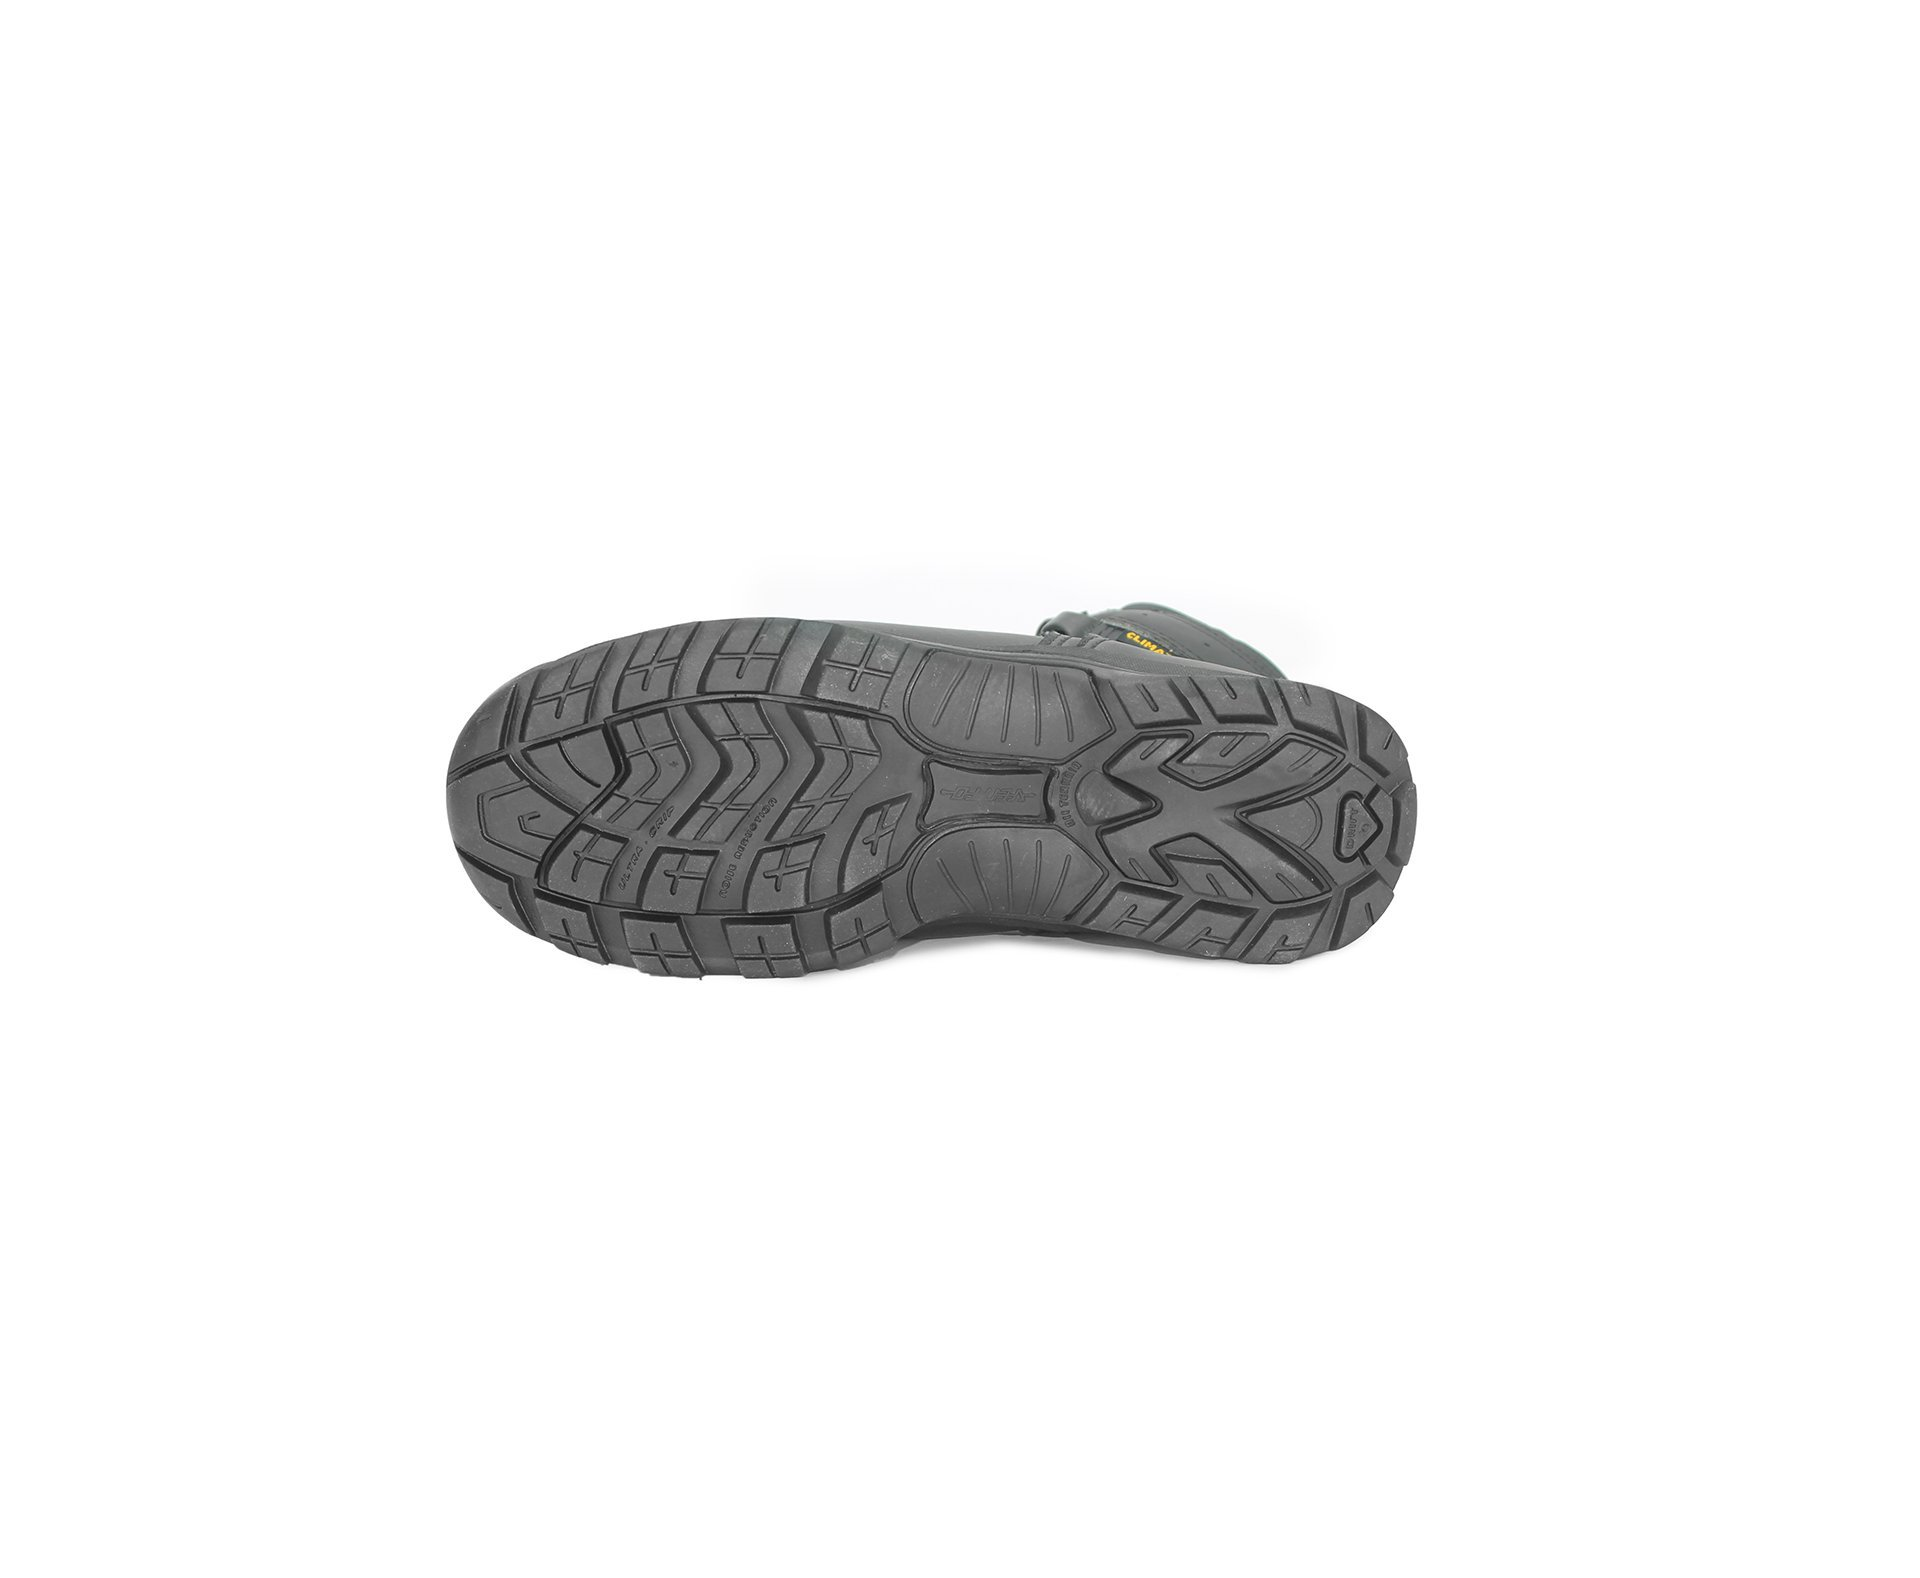 Bota Vento New X-pro Iii Waterproof Preta  - 36